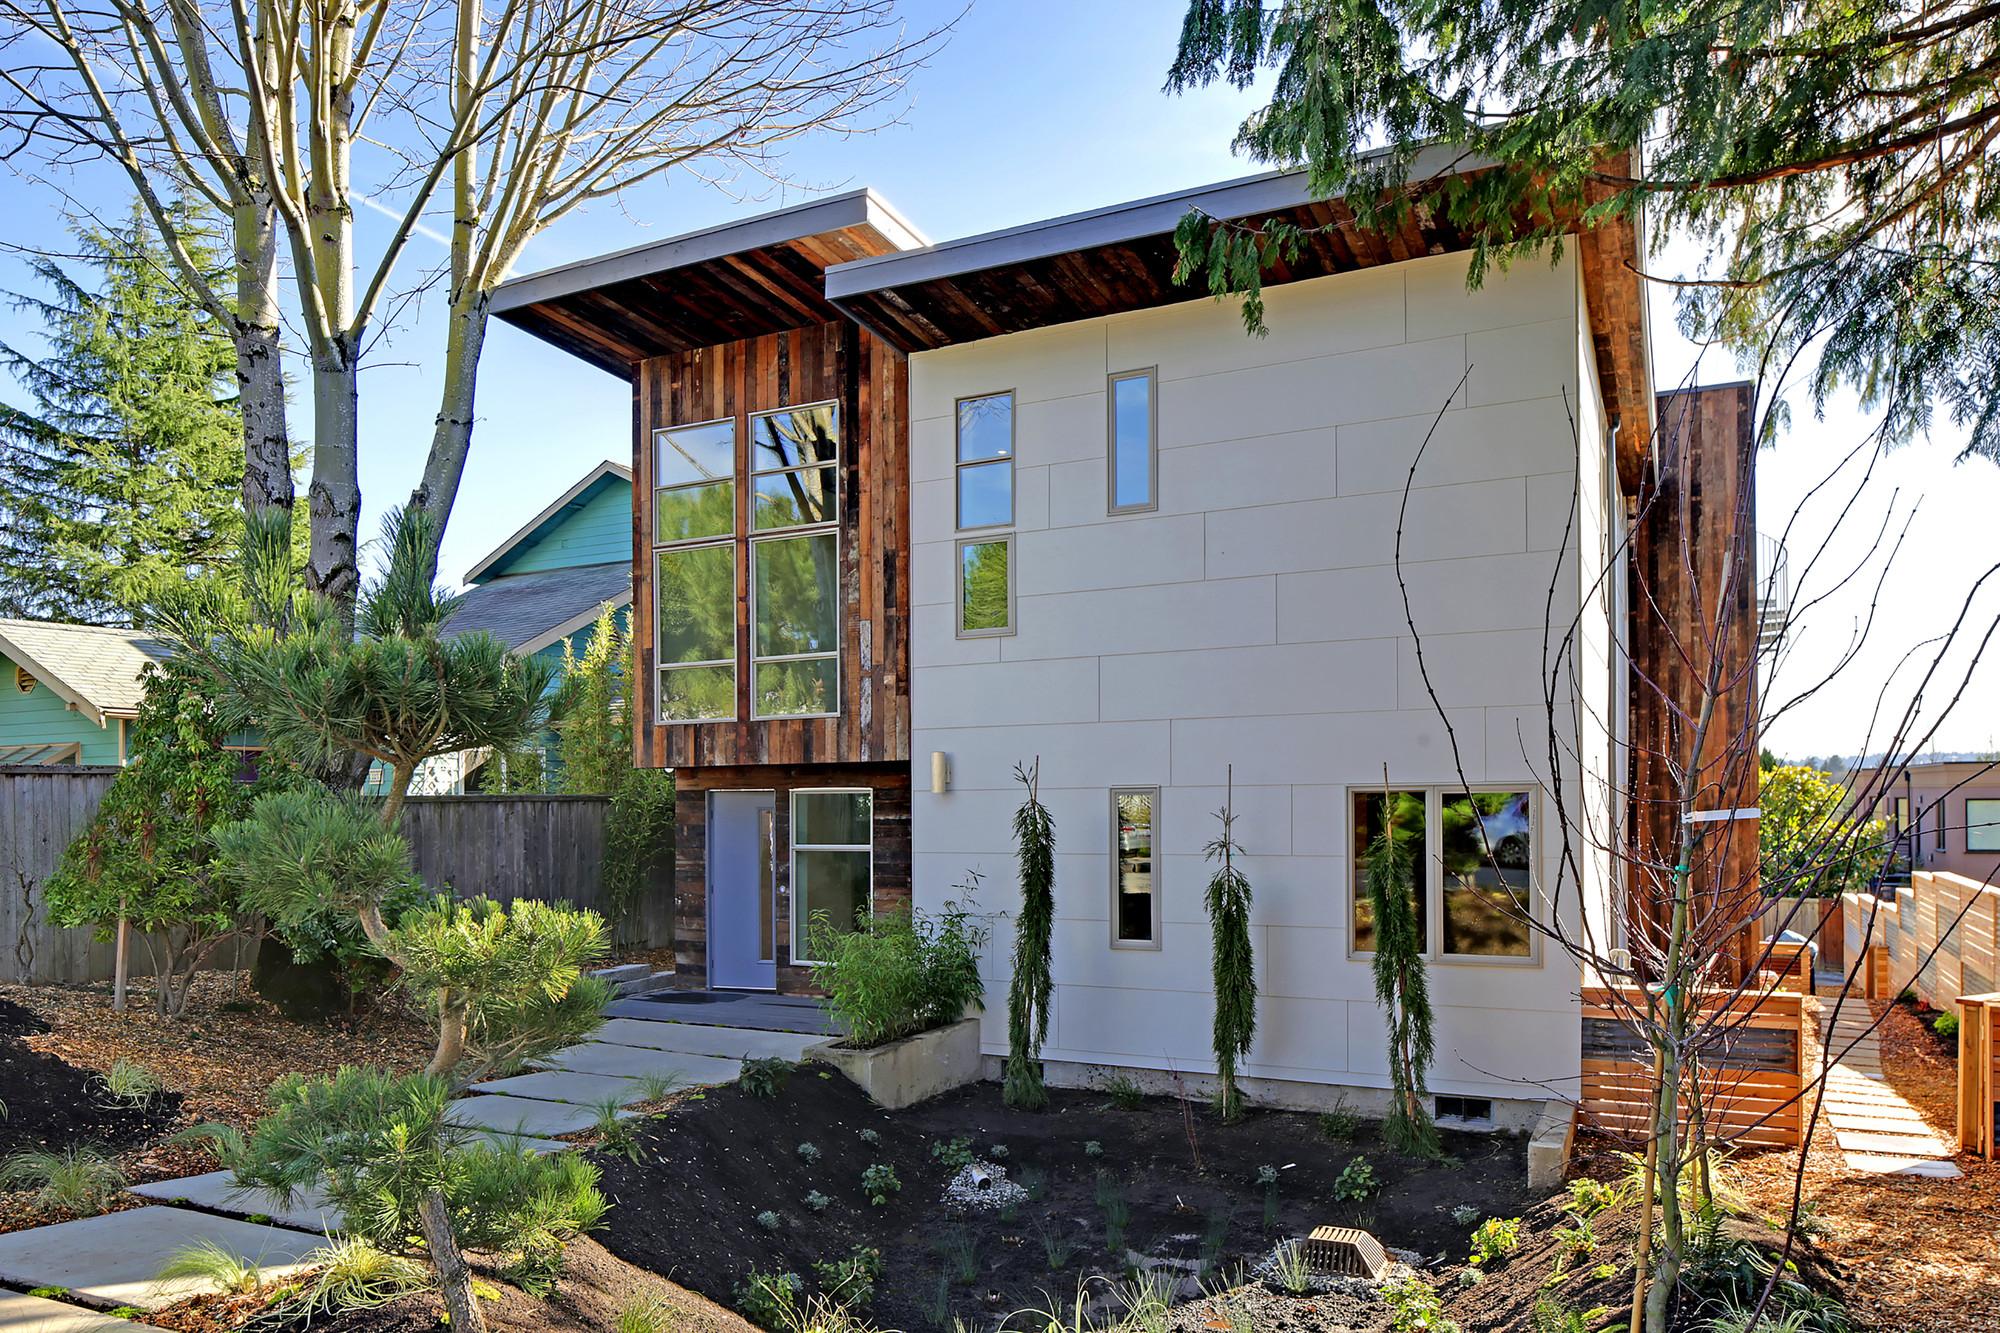 environmentally-friendly home design